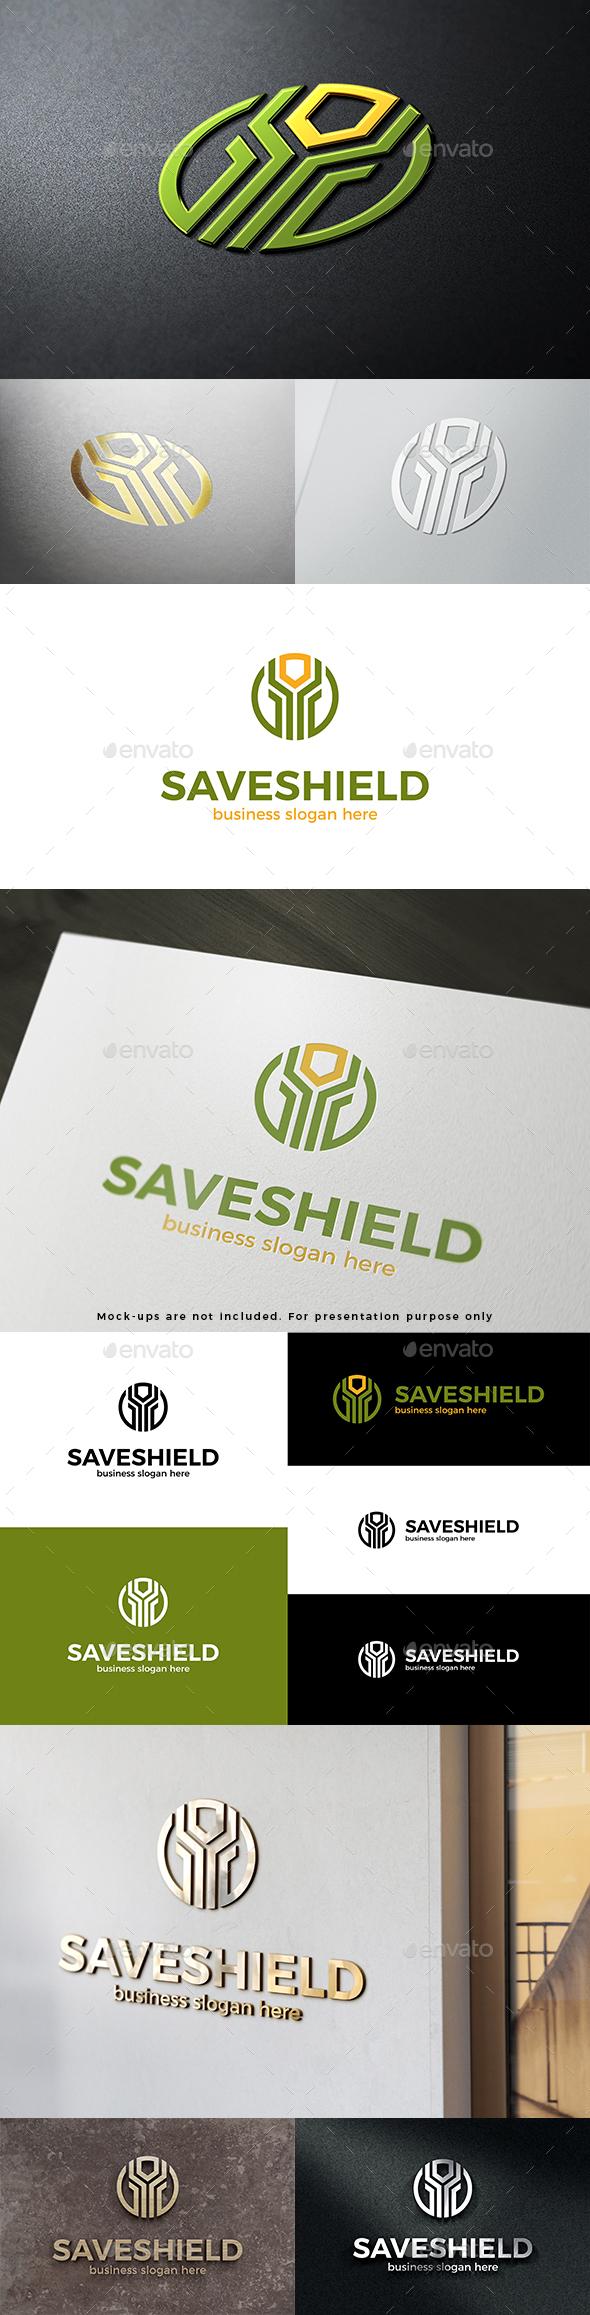 Save Shield Abstract Vector Logo Template